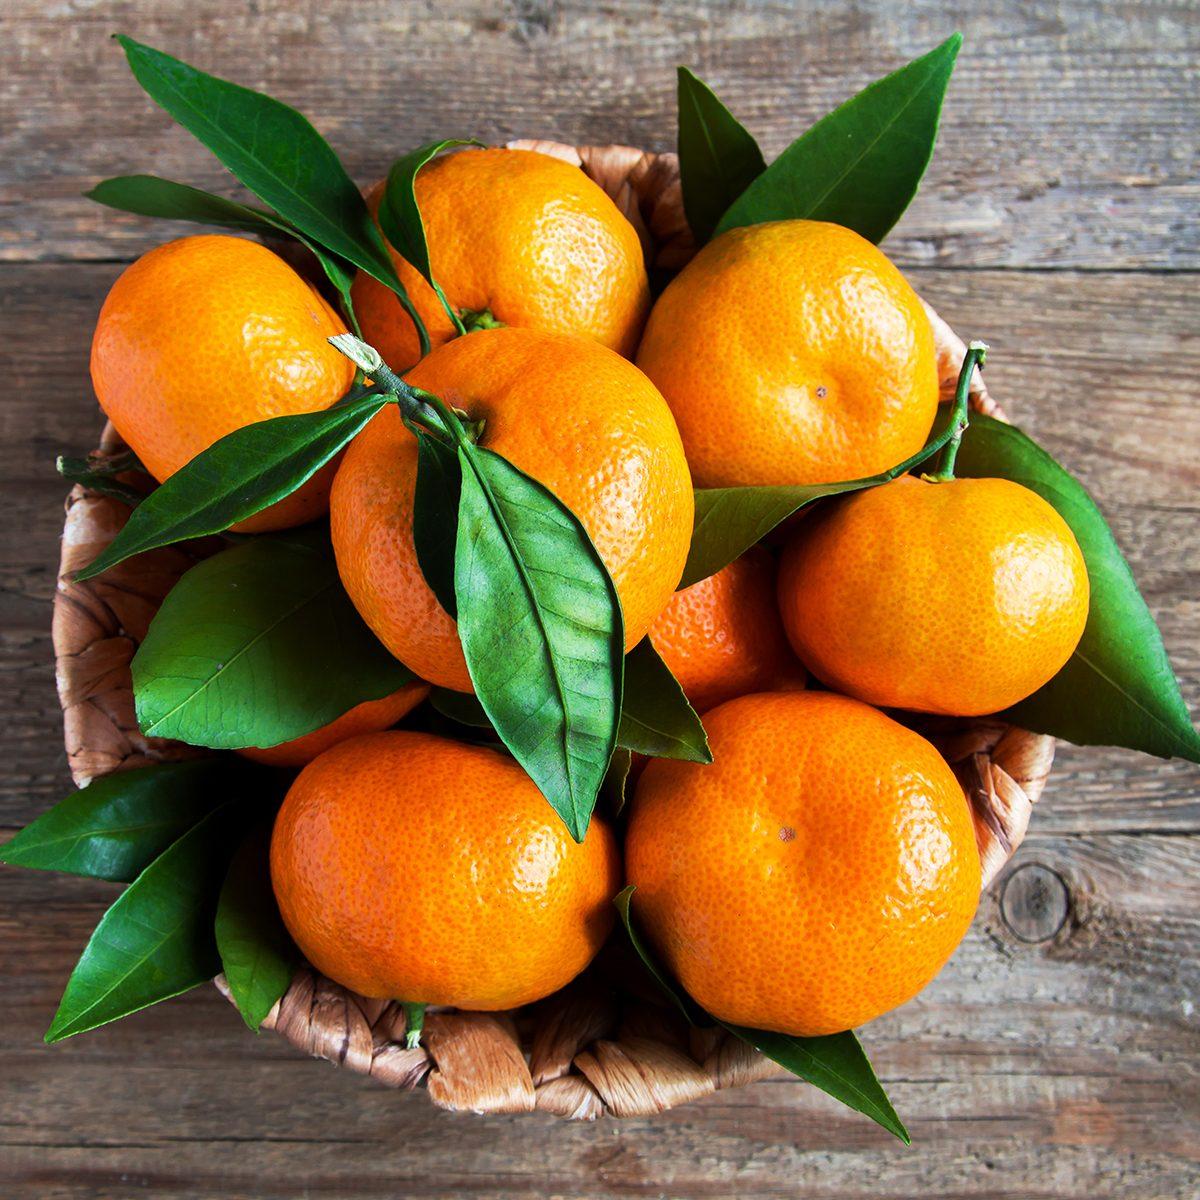 tangerines-oranges-mandarins-clementines-citrus-fruits-shutterstock_749282365